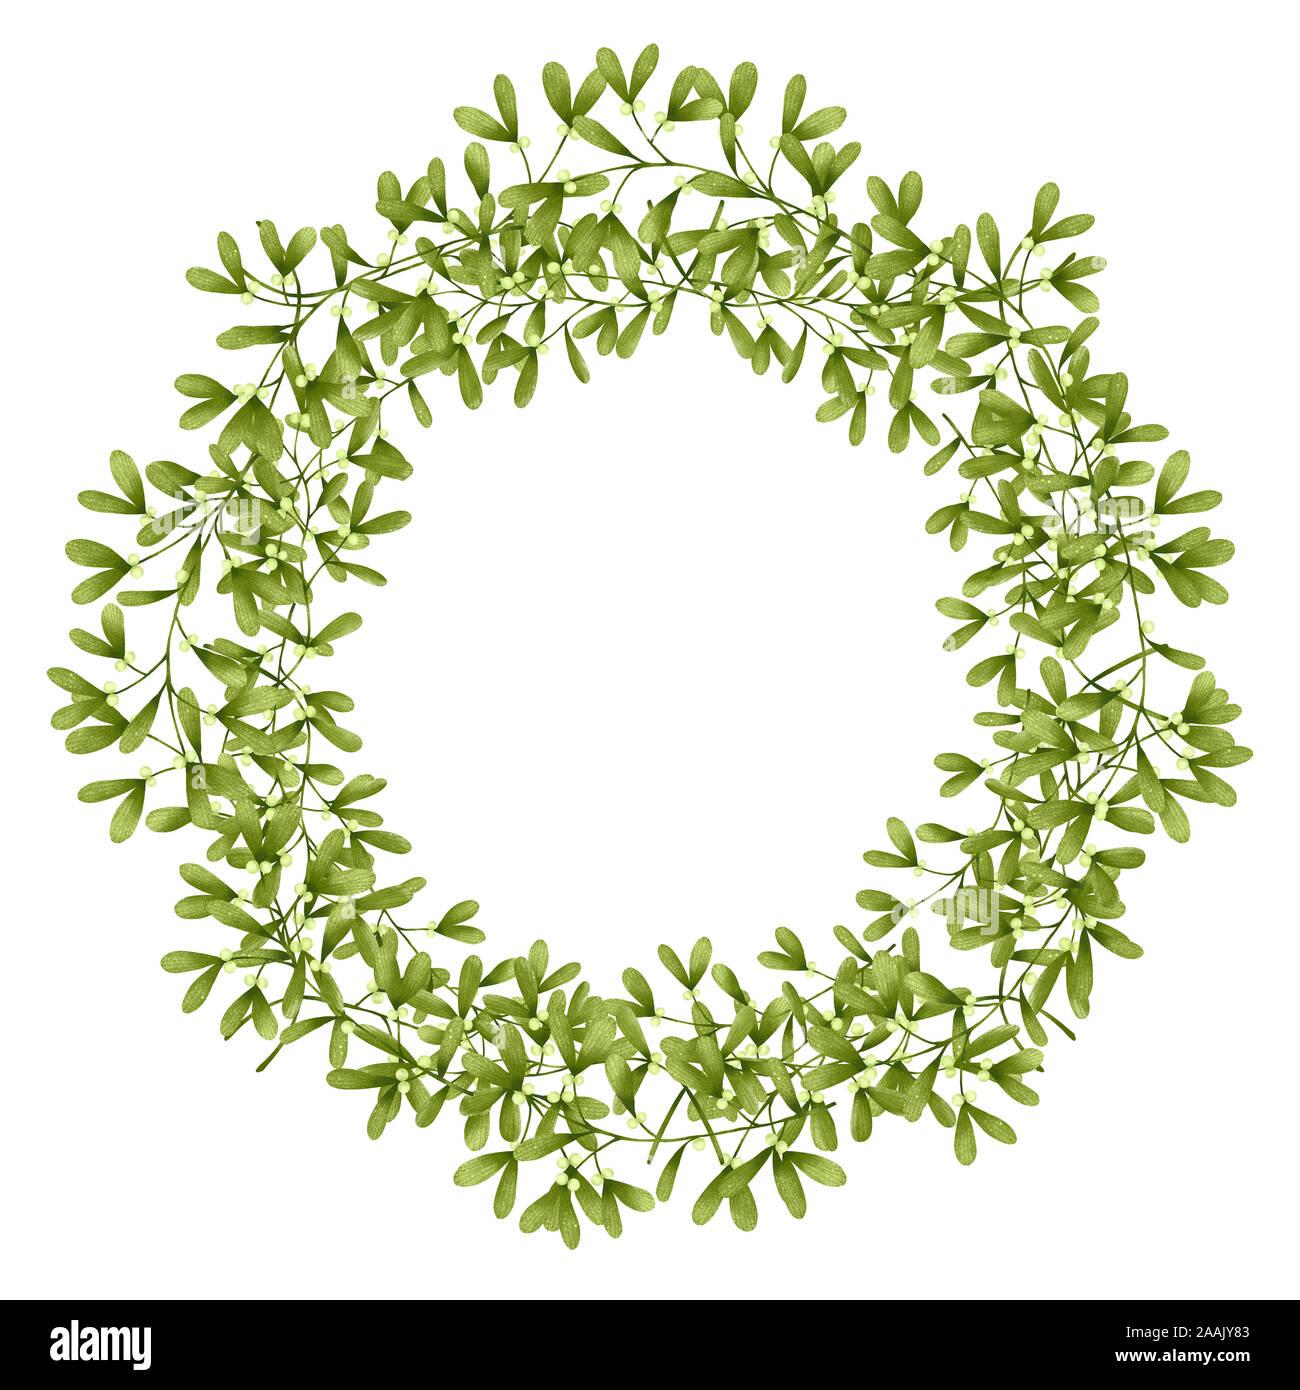 A Mistletoe Wreath Wedding Invitation Design Template